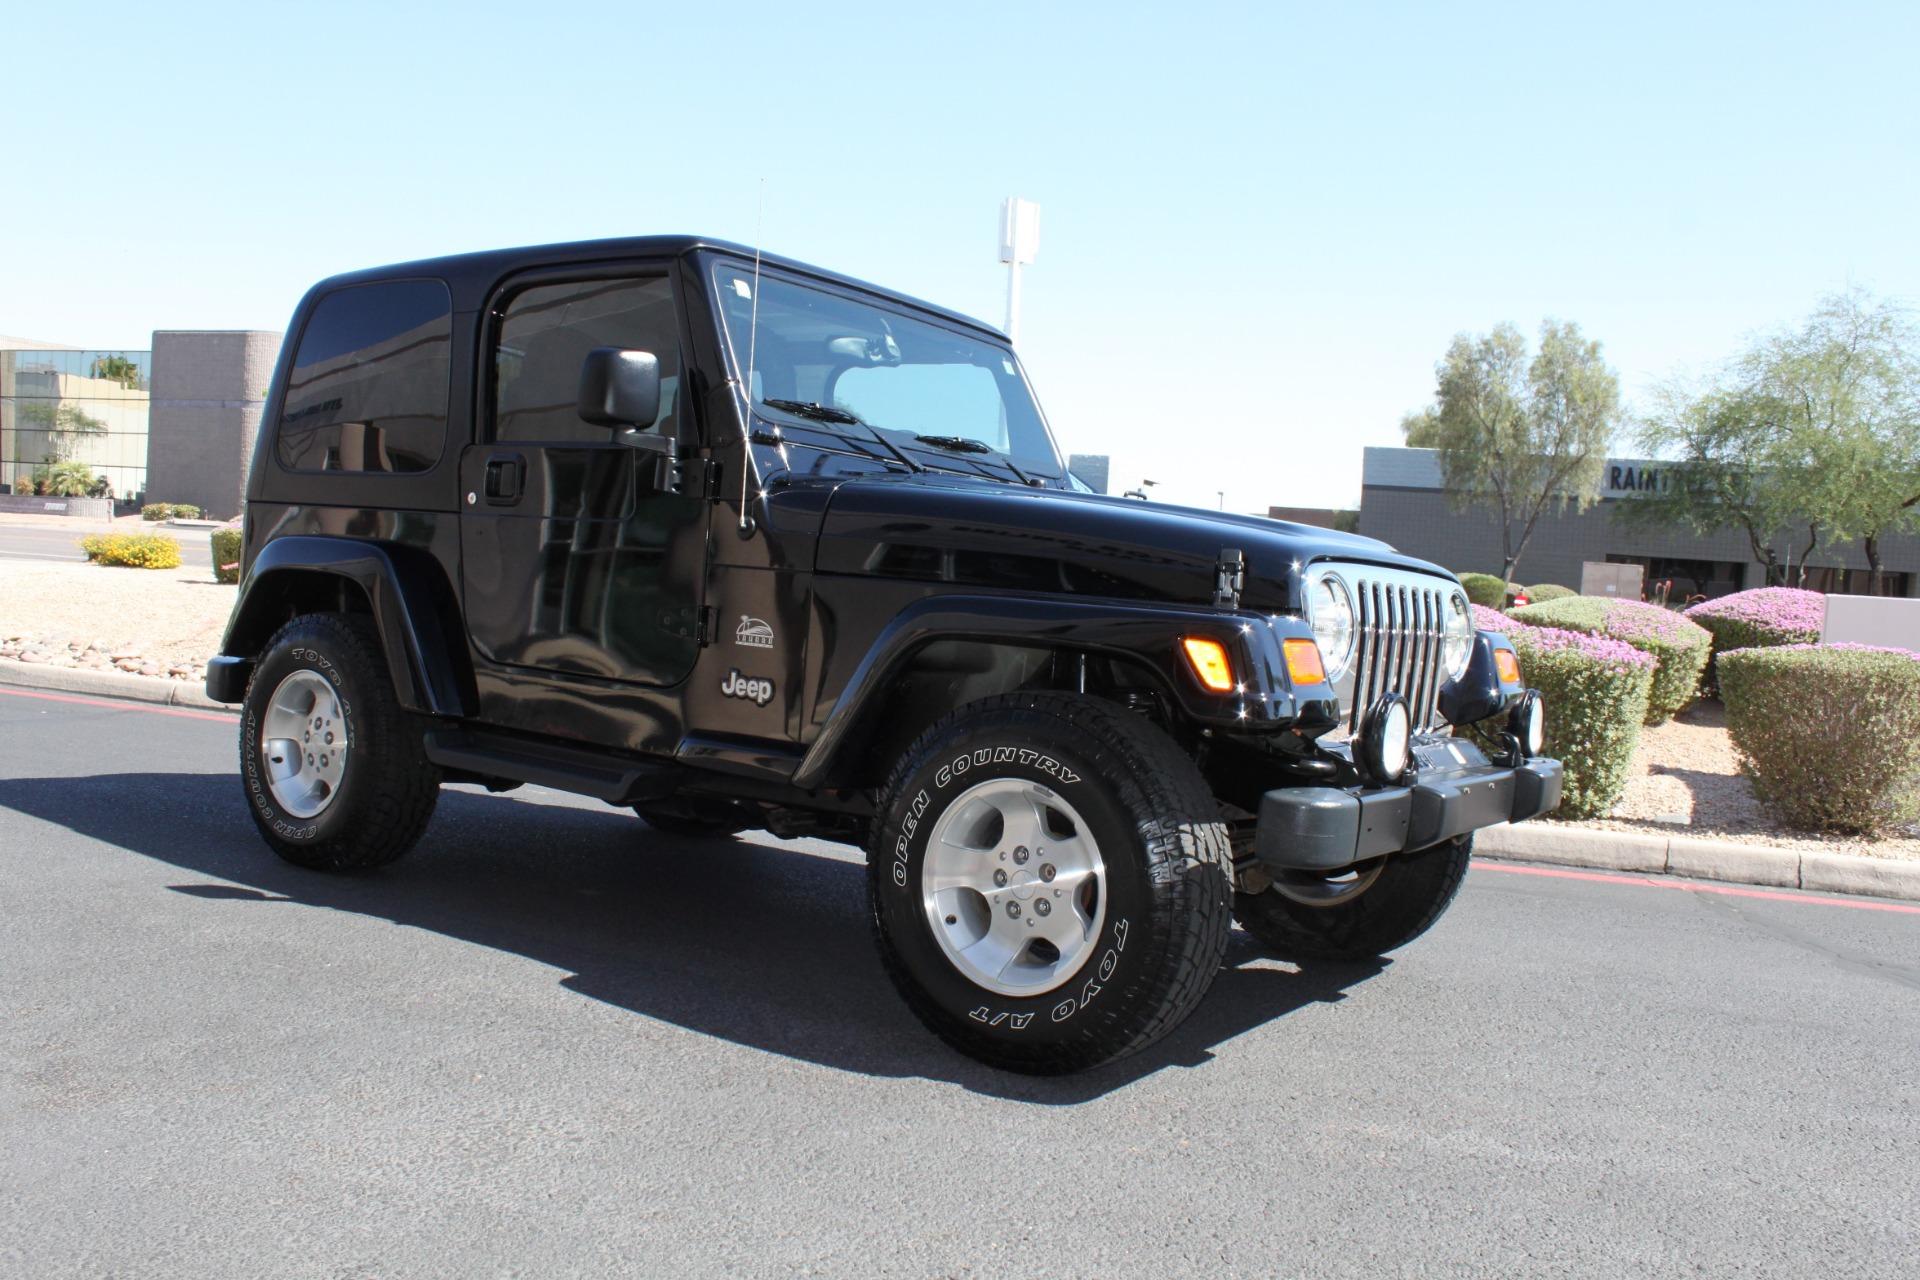 Used-2003-Jeep-Wrangler-Sahara-Lexus